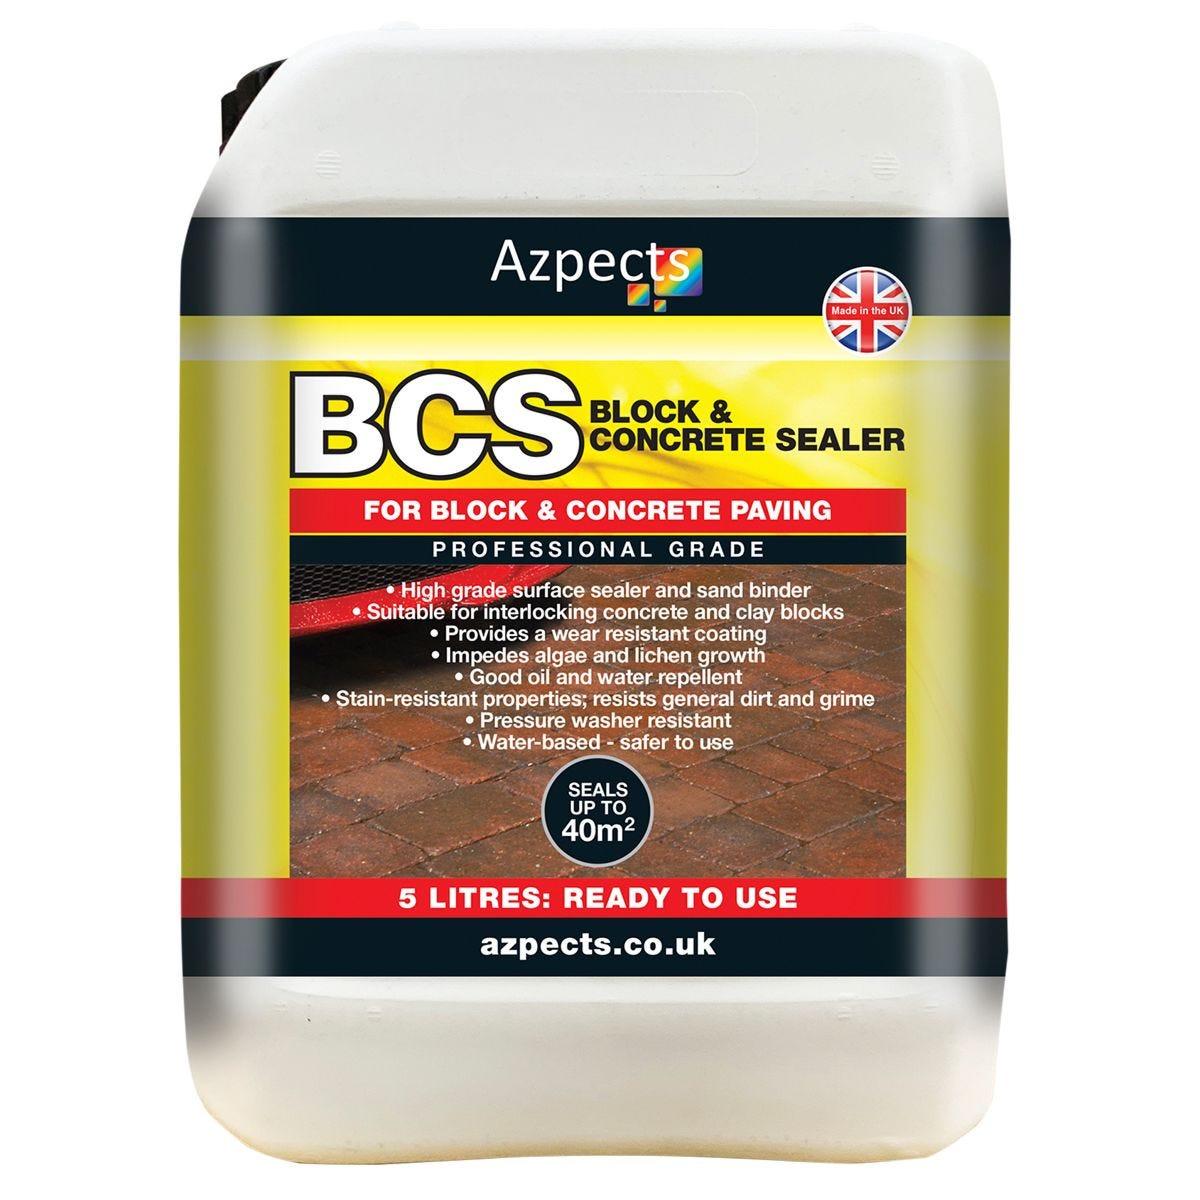 Azpects EASY Seal BCS Block & Concrete Sealer - 5L